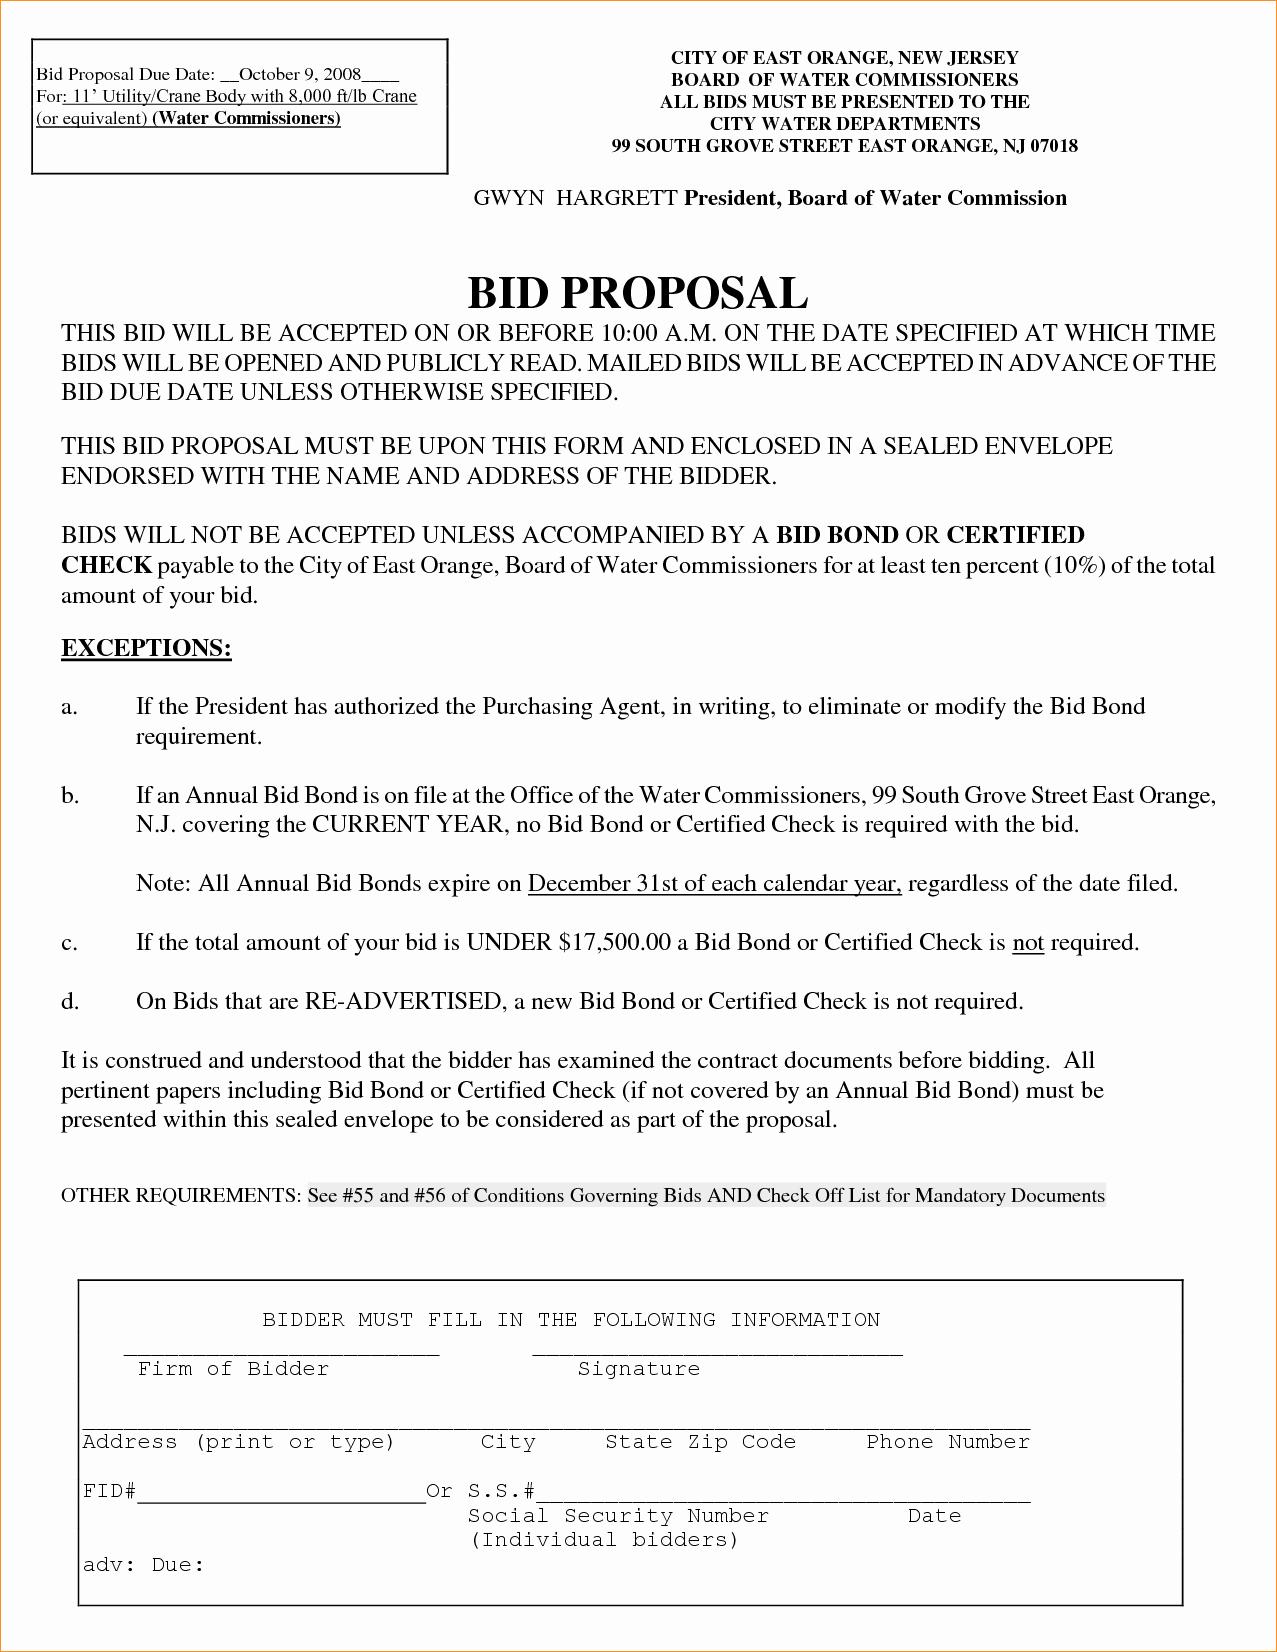 Government Bid Proposal Template